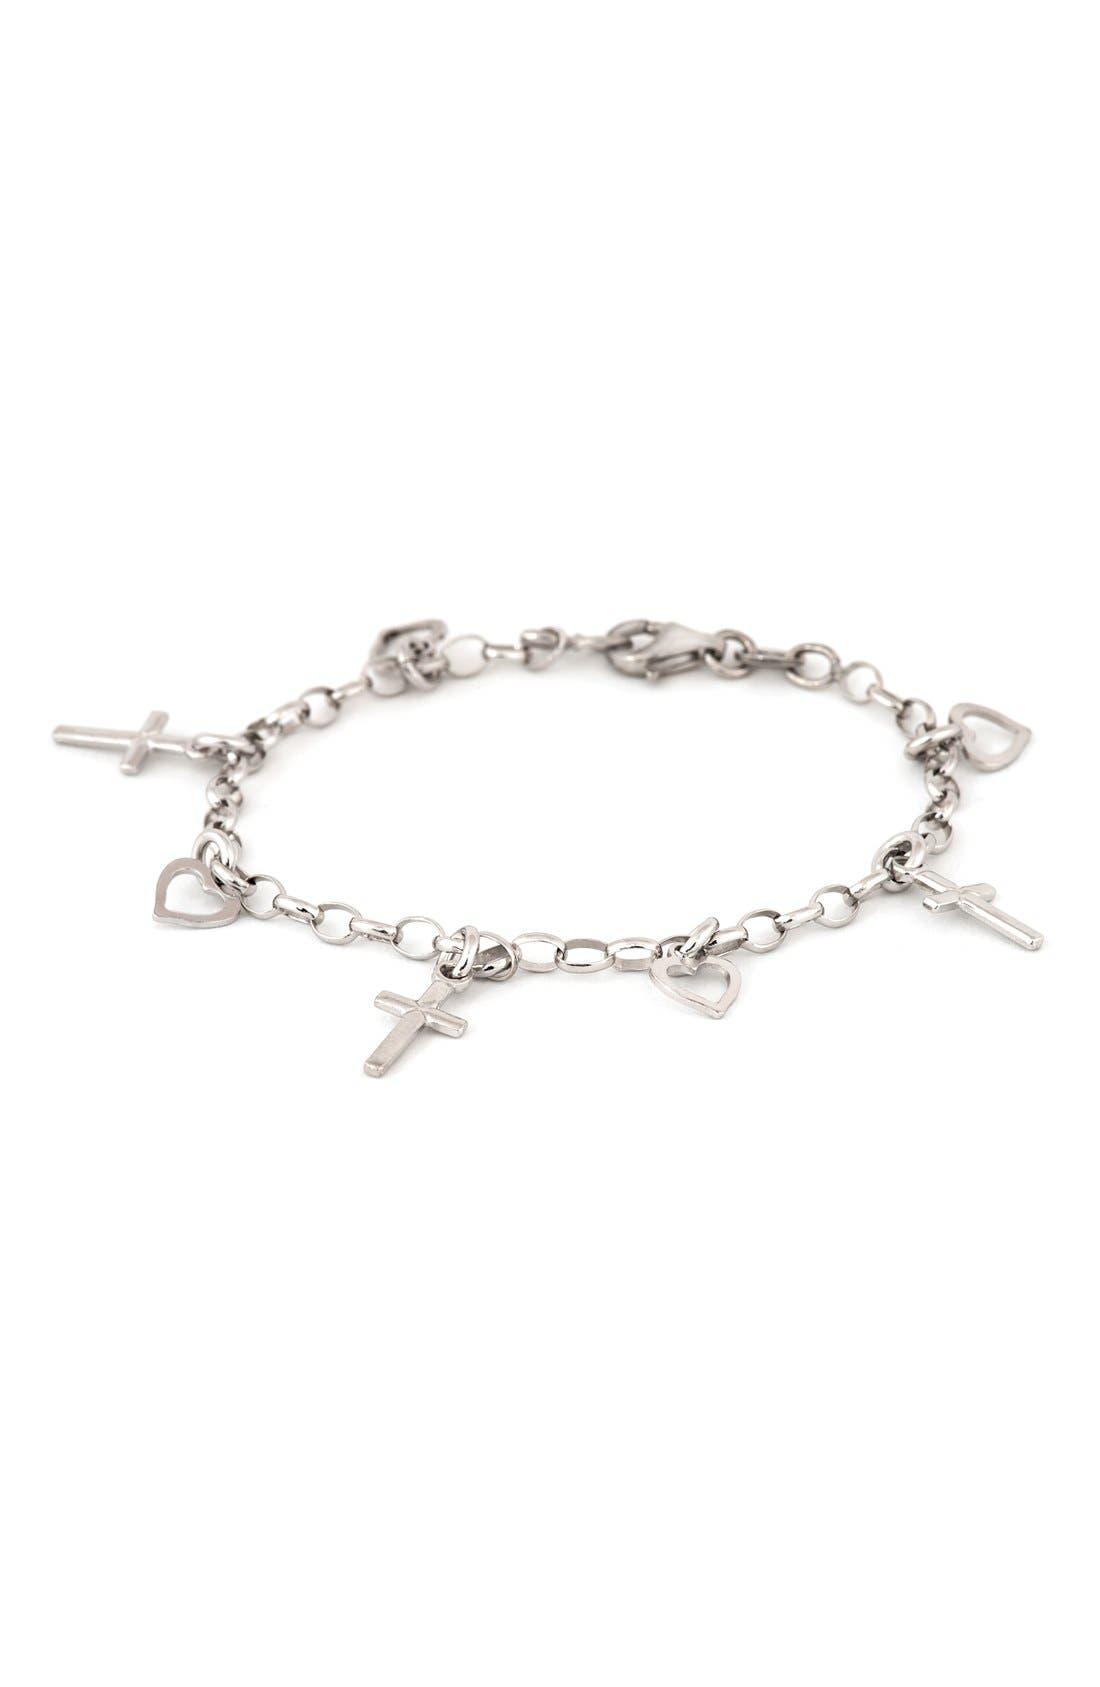 Cross & Heart Sterling Silver Charm Bracelet,                         Main,                         color, None